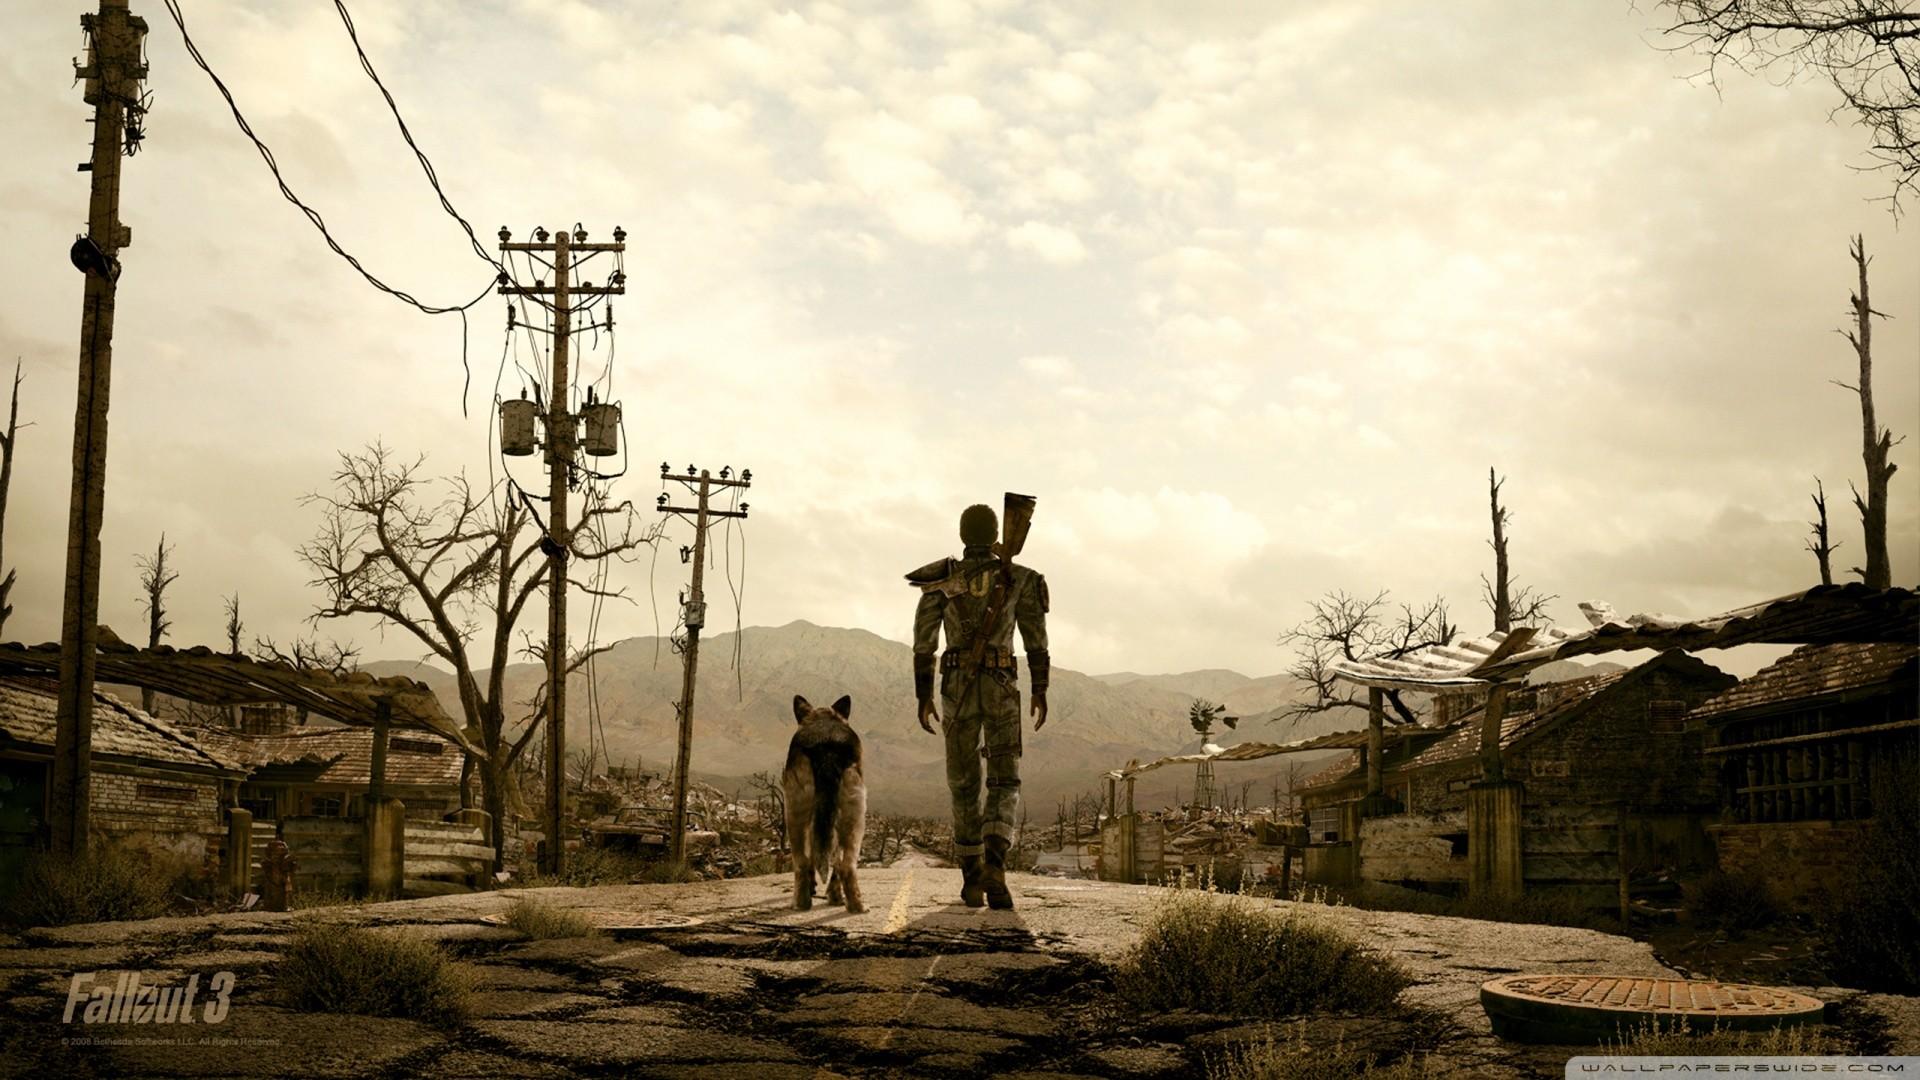 fallout_3_man_and_his_dog-wallpaper-1920×1080-by-KillerJack666